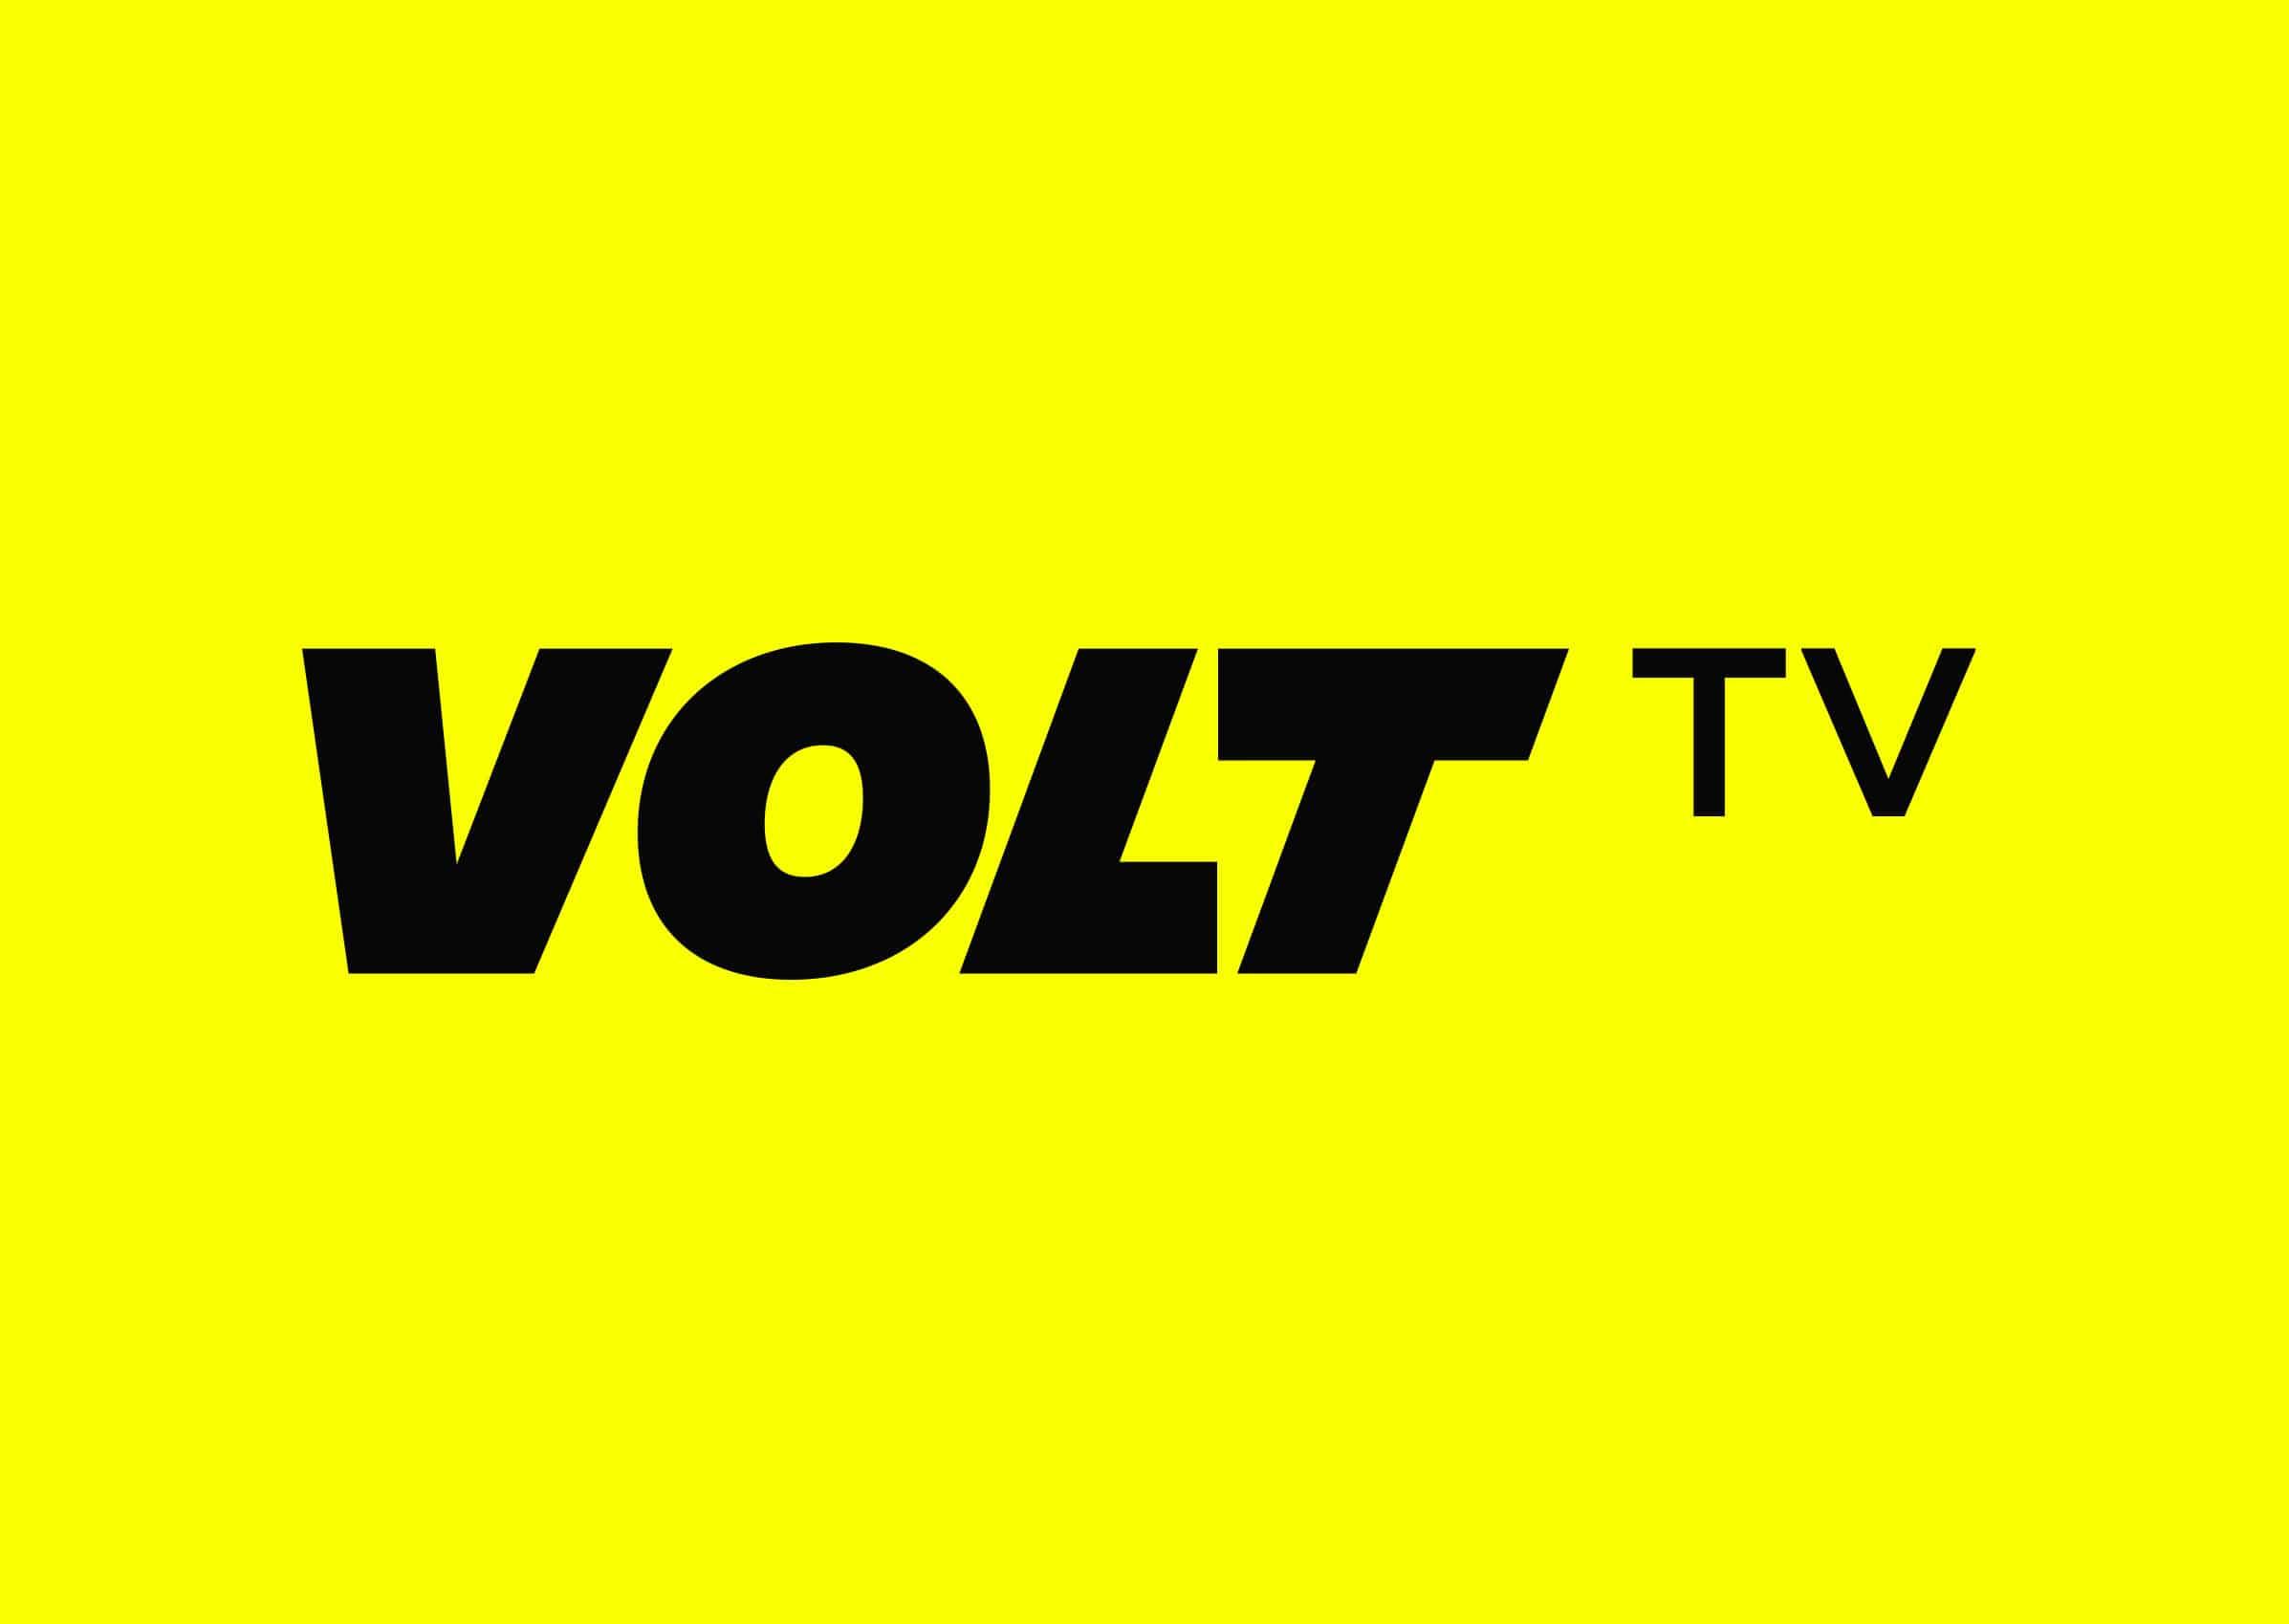 negative-space-logo-volt-tv